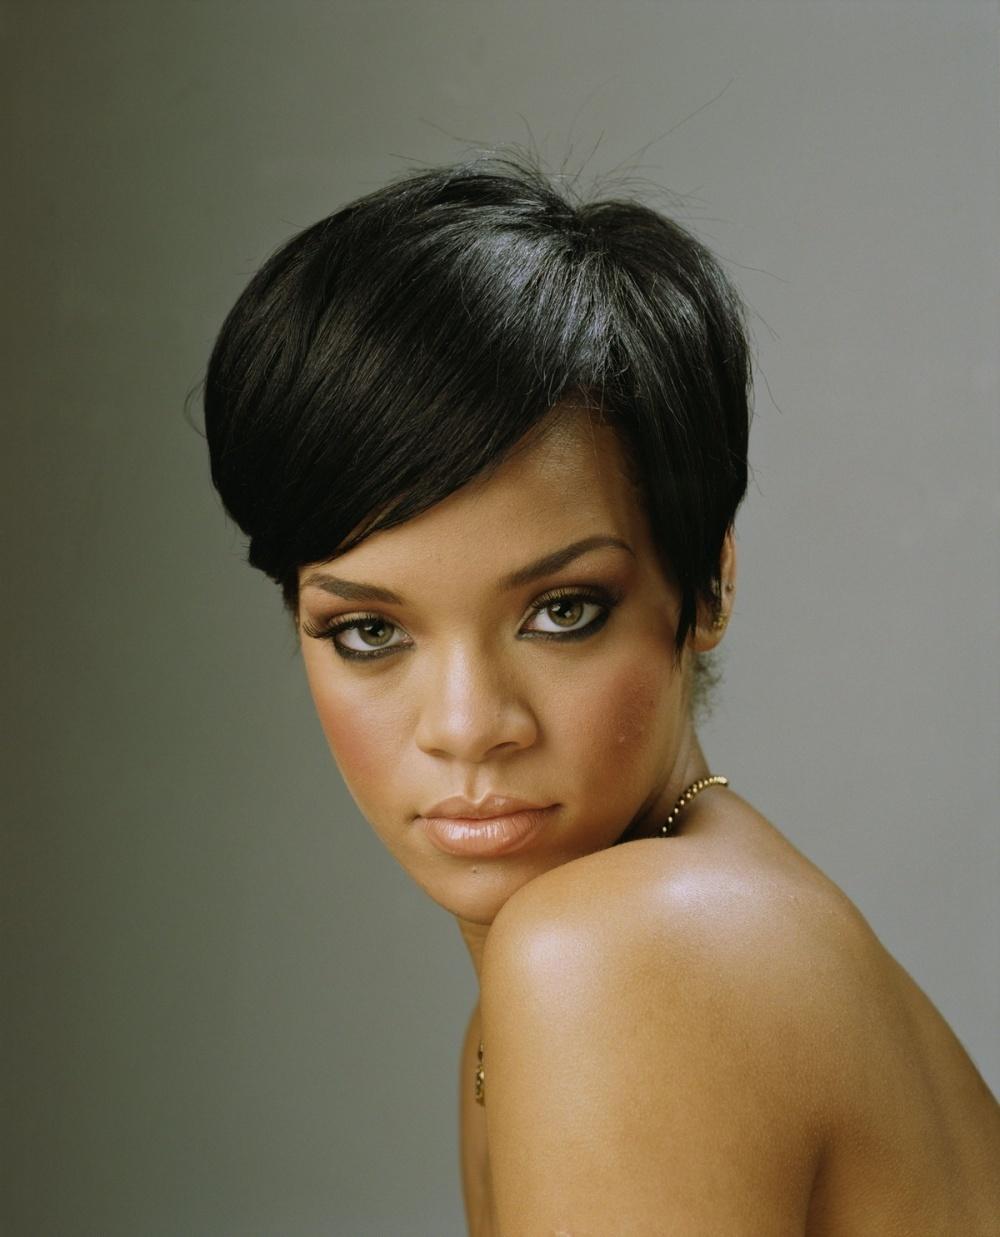 Awe Inspiring Top 14 Rihanna Hairstyles For Corporate Ladies Hairstyles For Woman Short Hairstyles For Black Women Fulllsitofus